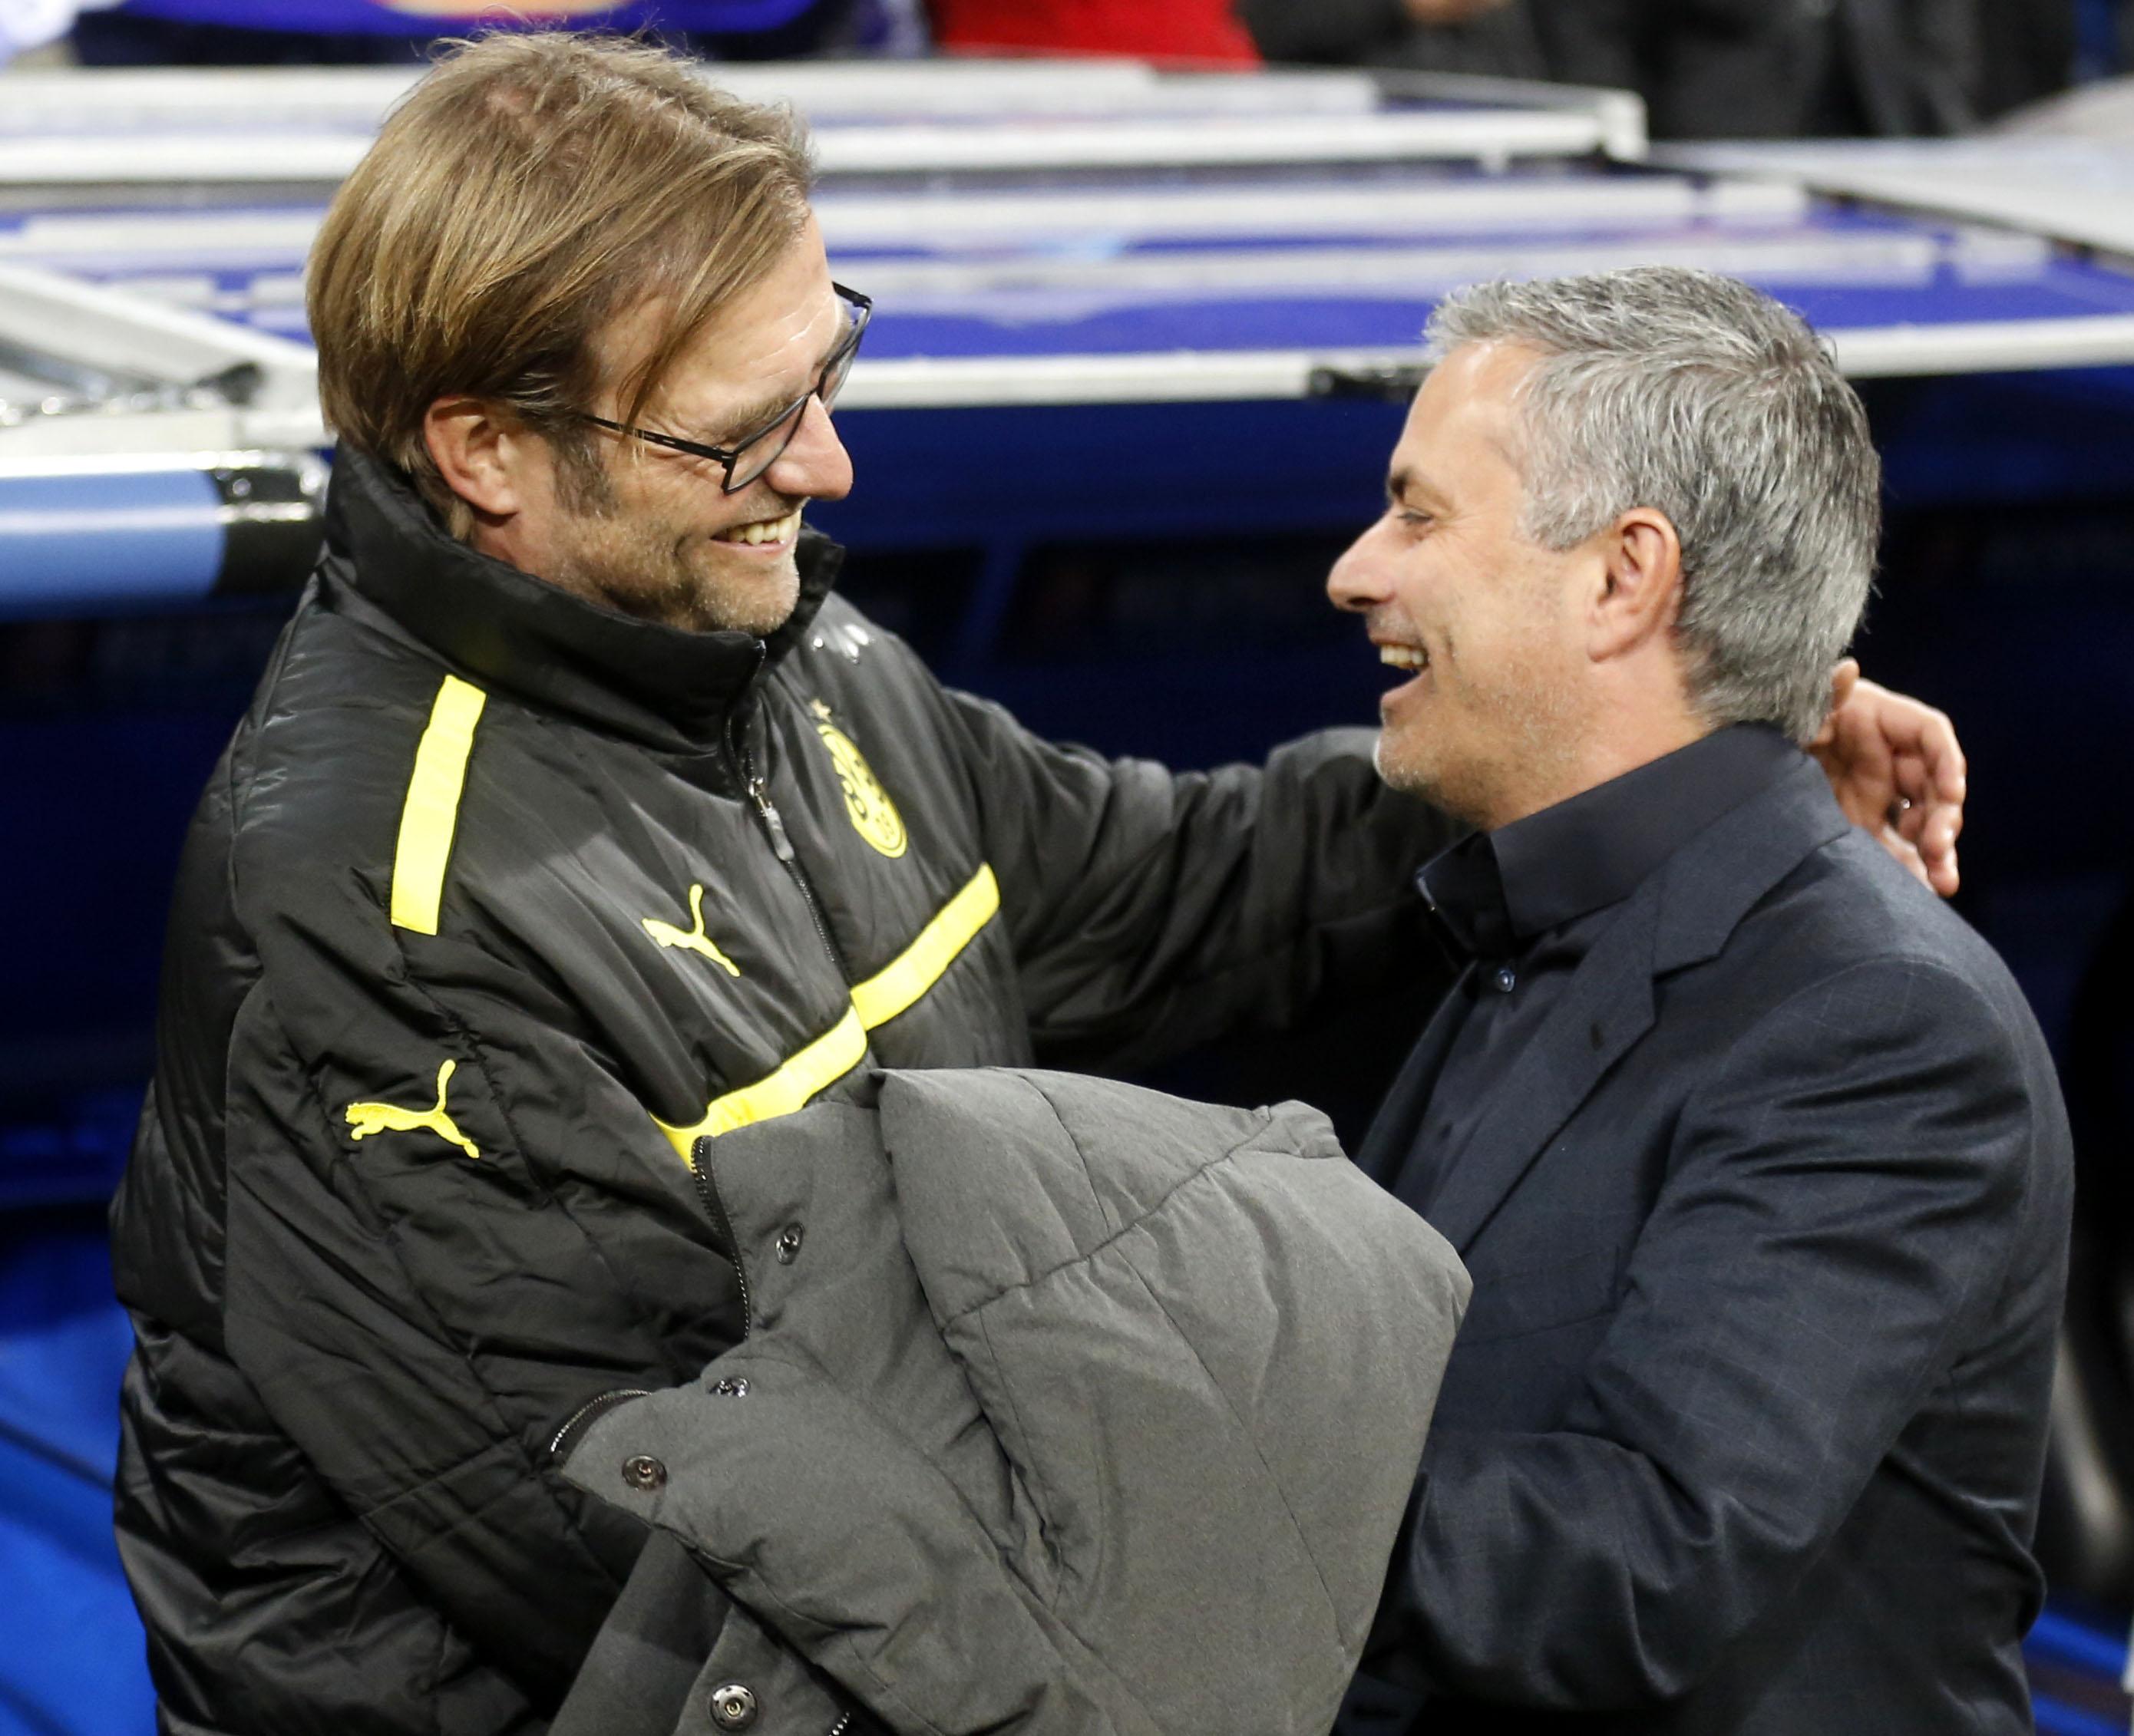 Jose Mourinho (R) and Jurgen Klopp in 2013 (Reuters)